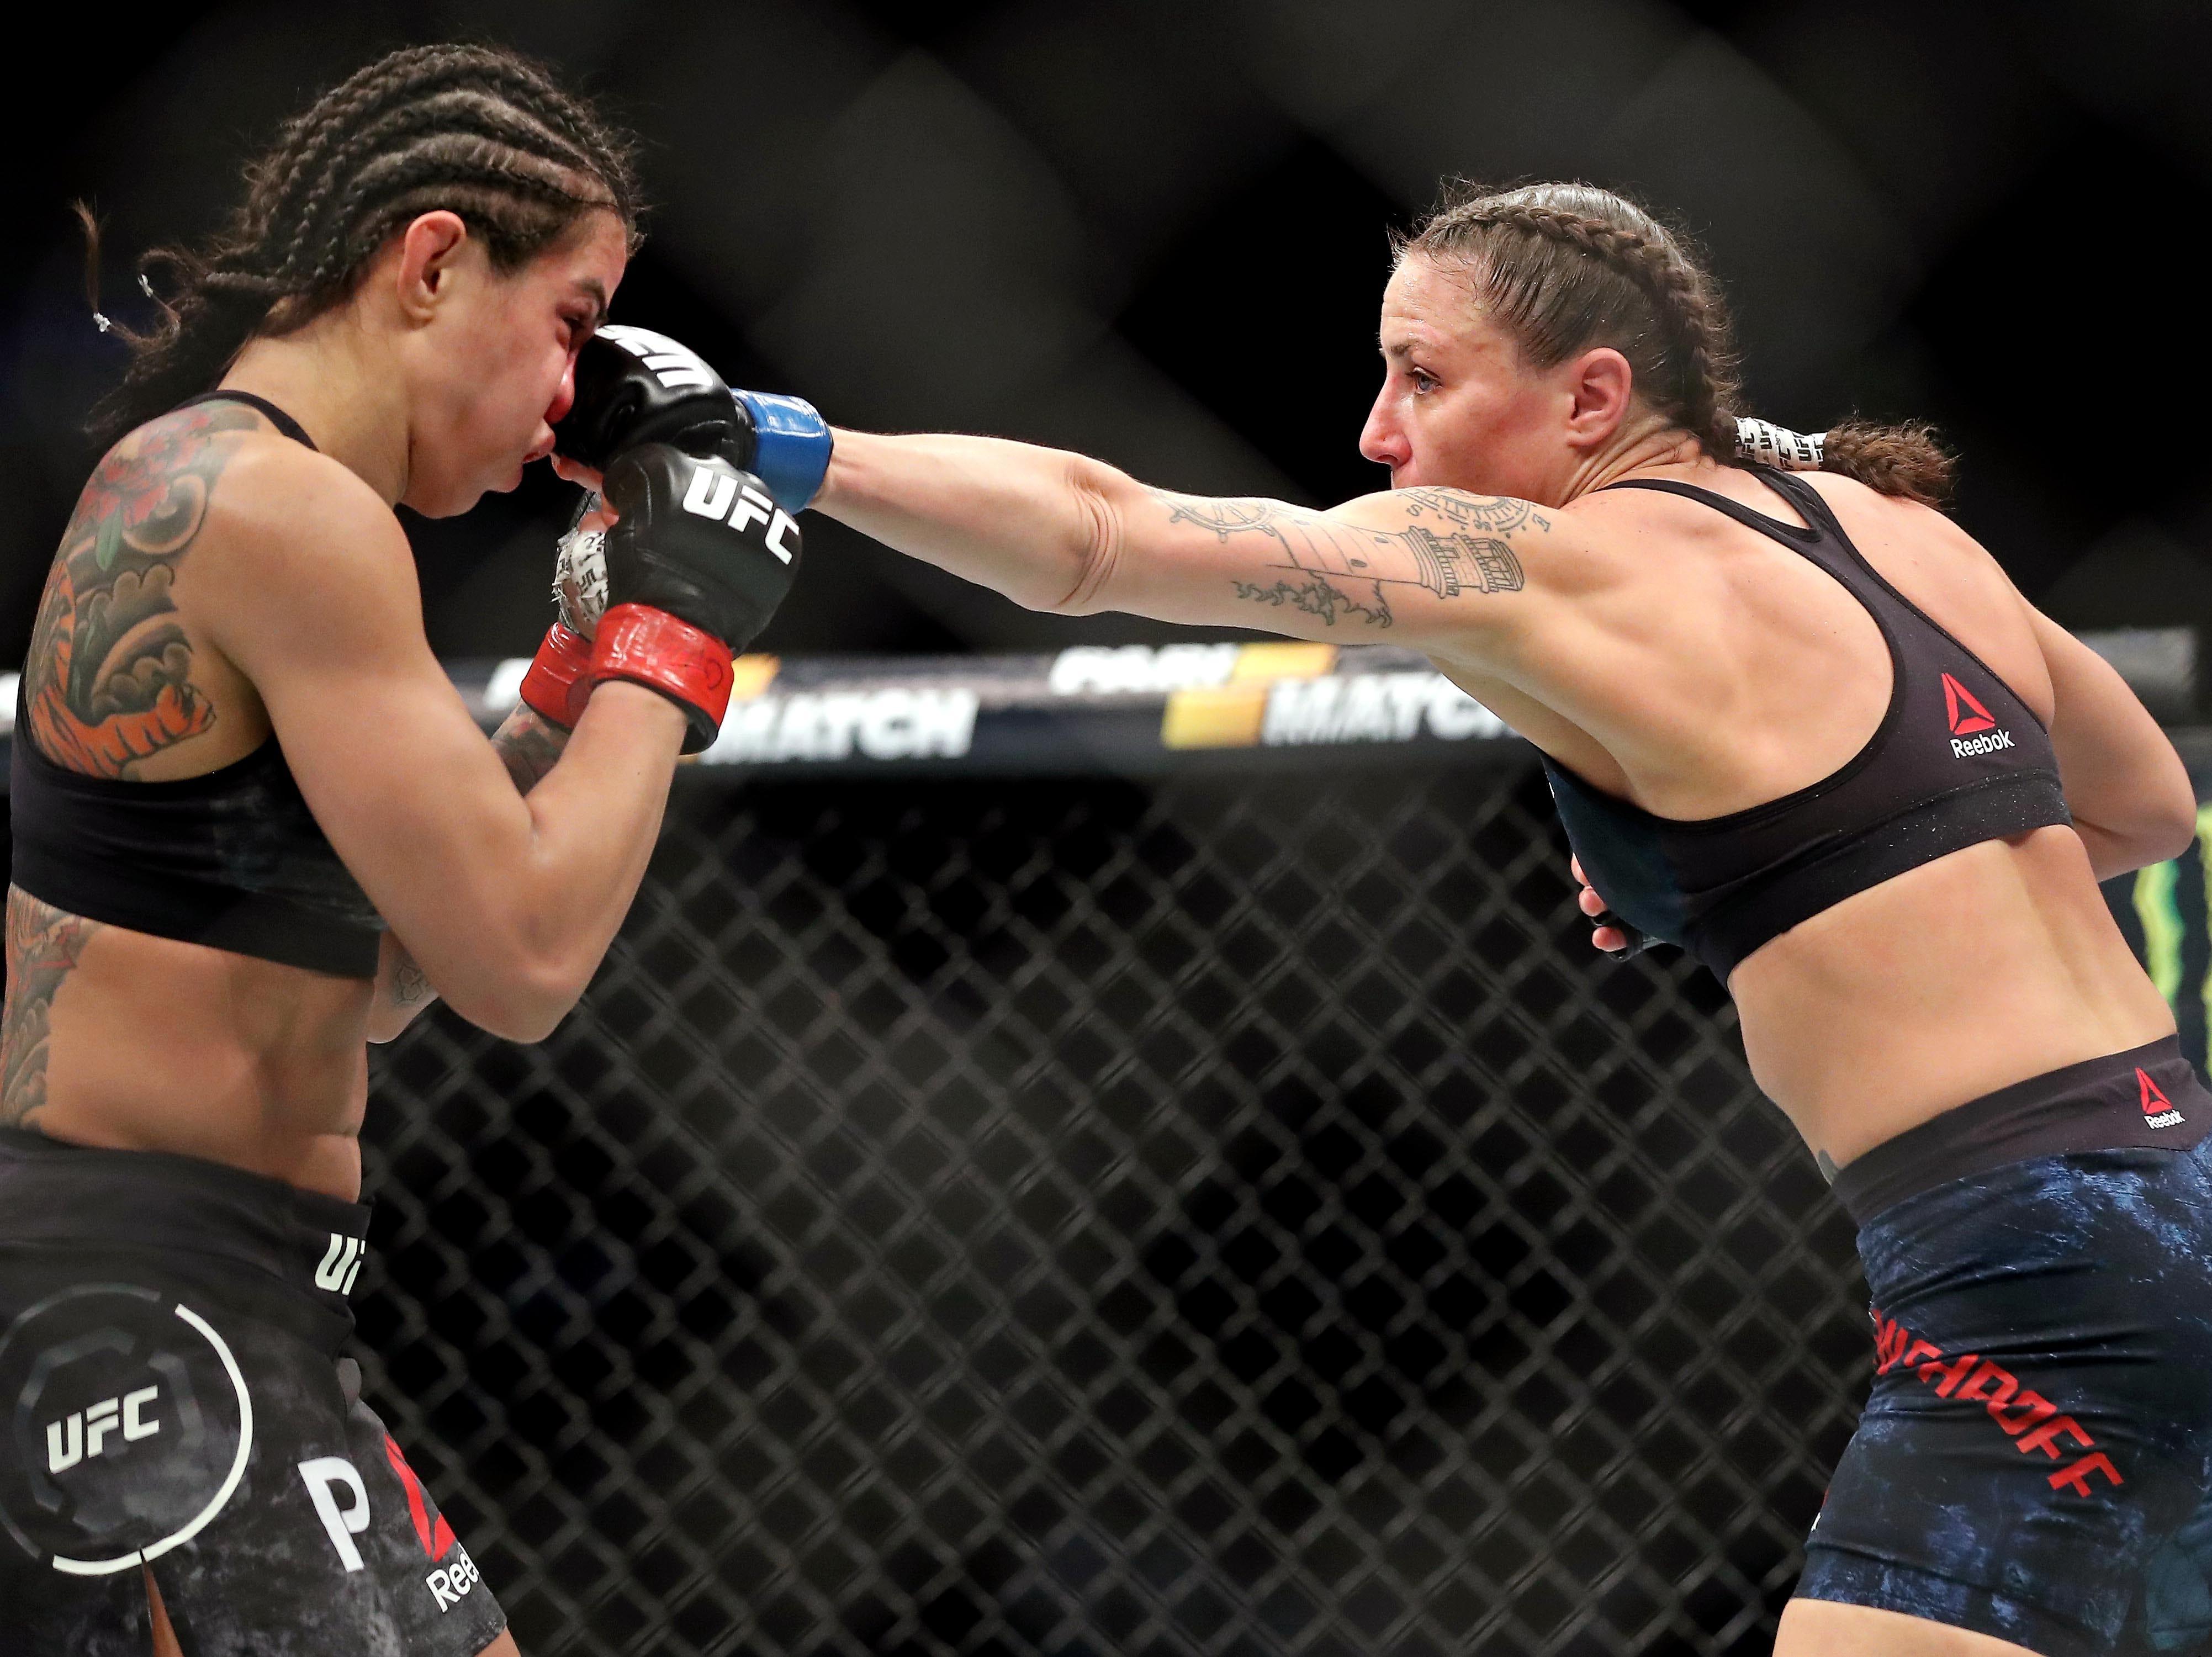 Claudia Gadelha (red gloves) fights Nina Ansaroff (blue gloves) during UFC 231 at Scotiabank Arena.